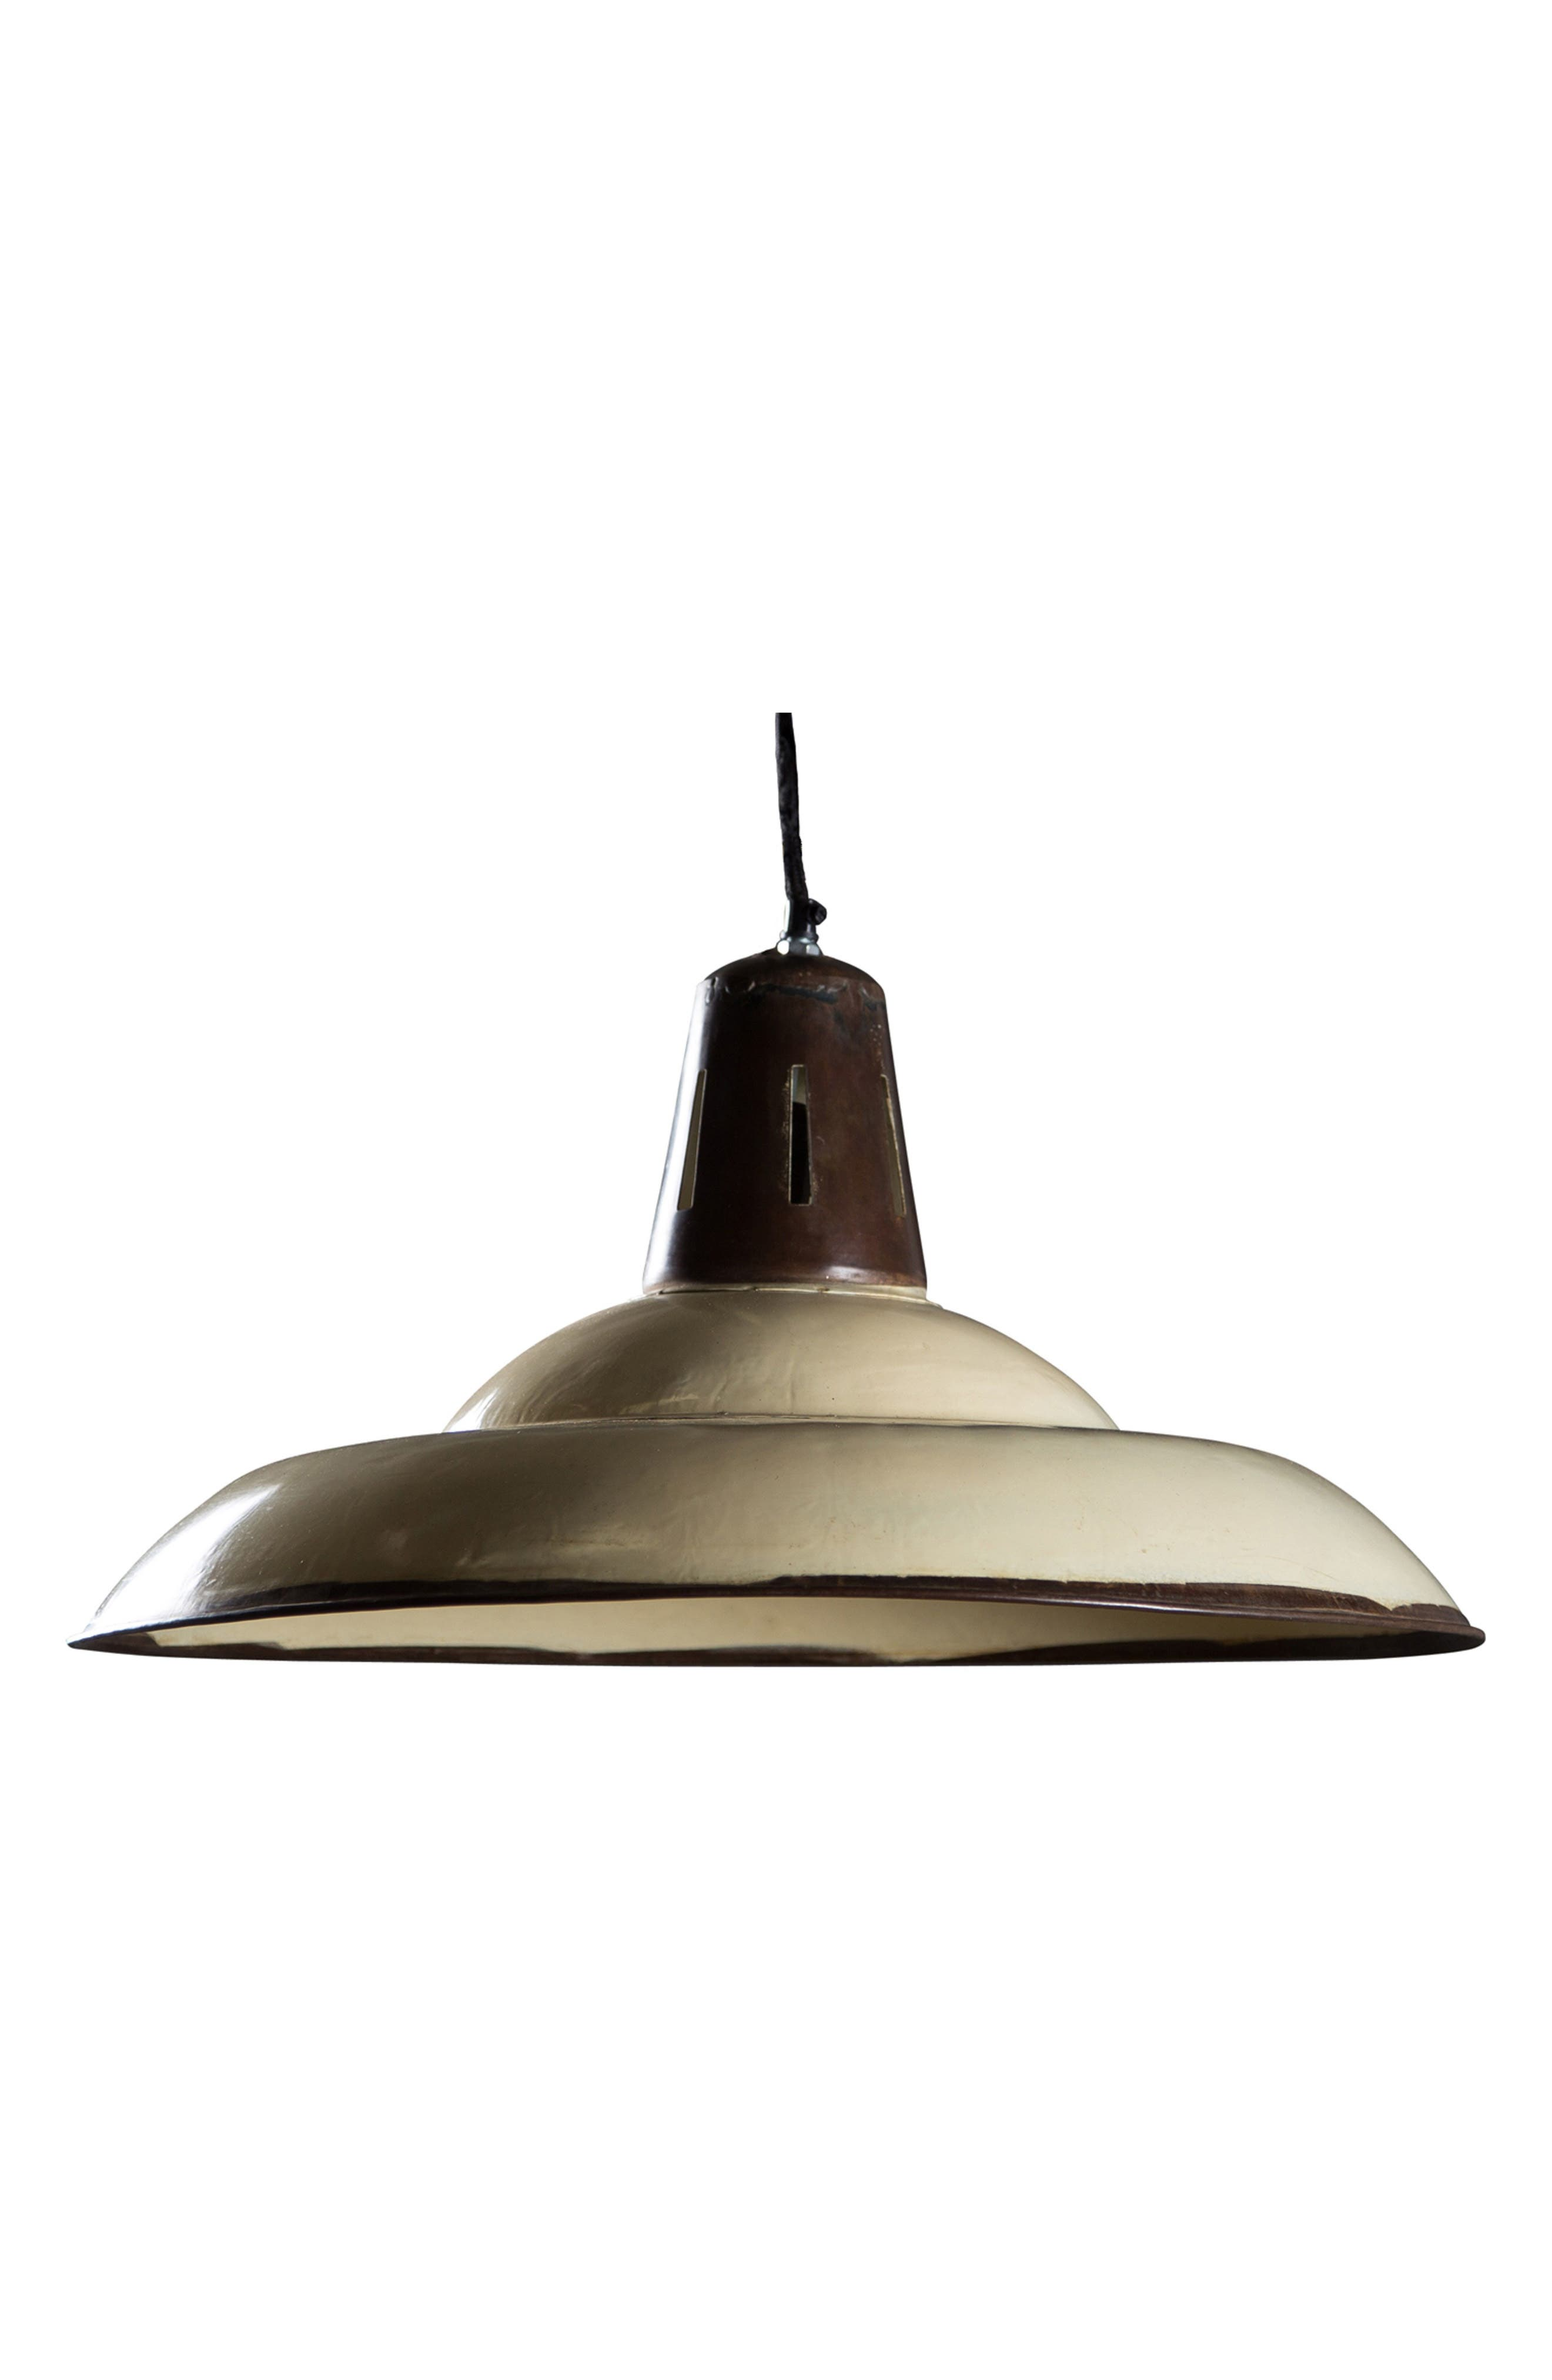 Whitner Hanging Lamp,                             Main thumbnail 1, color,                             VINTAGE CREAM